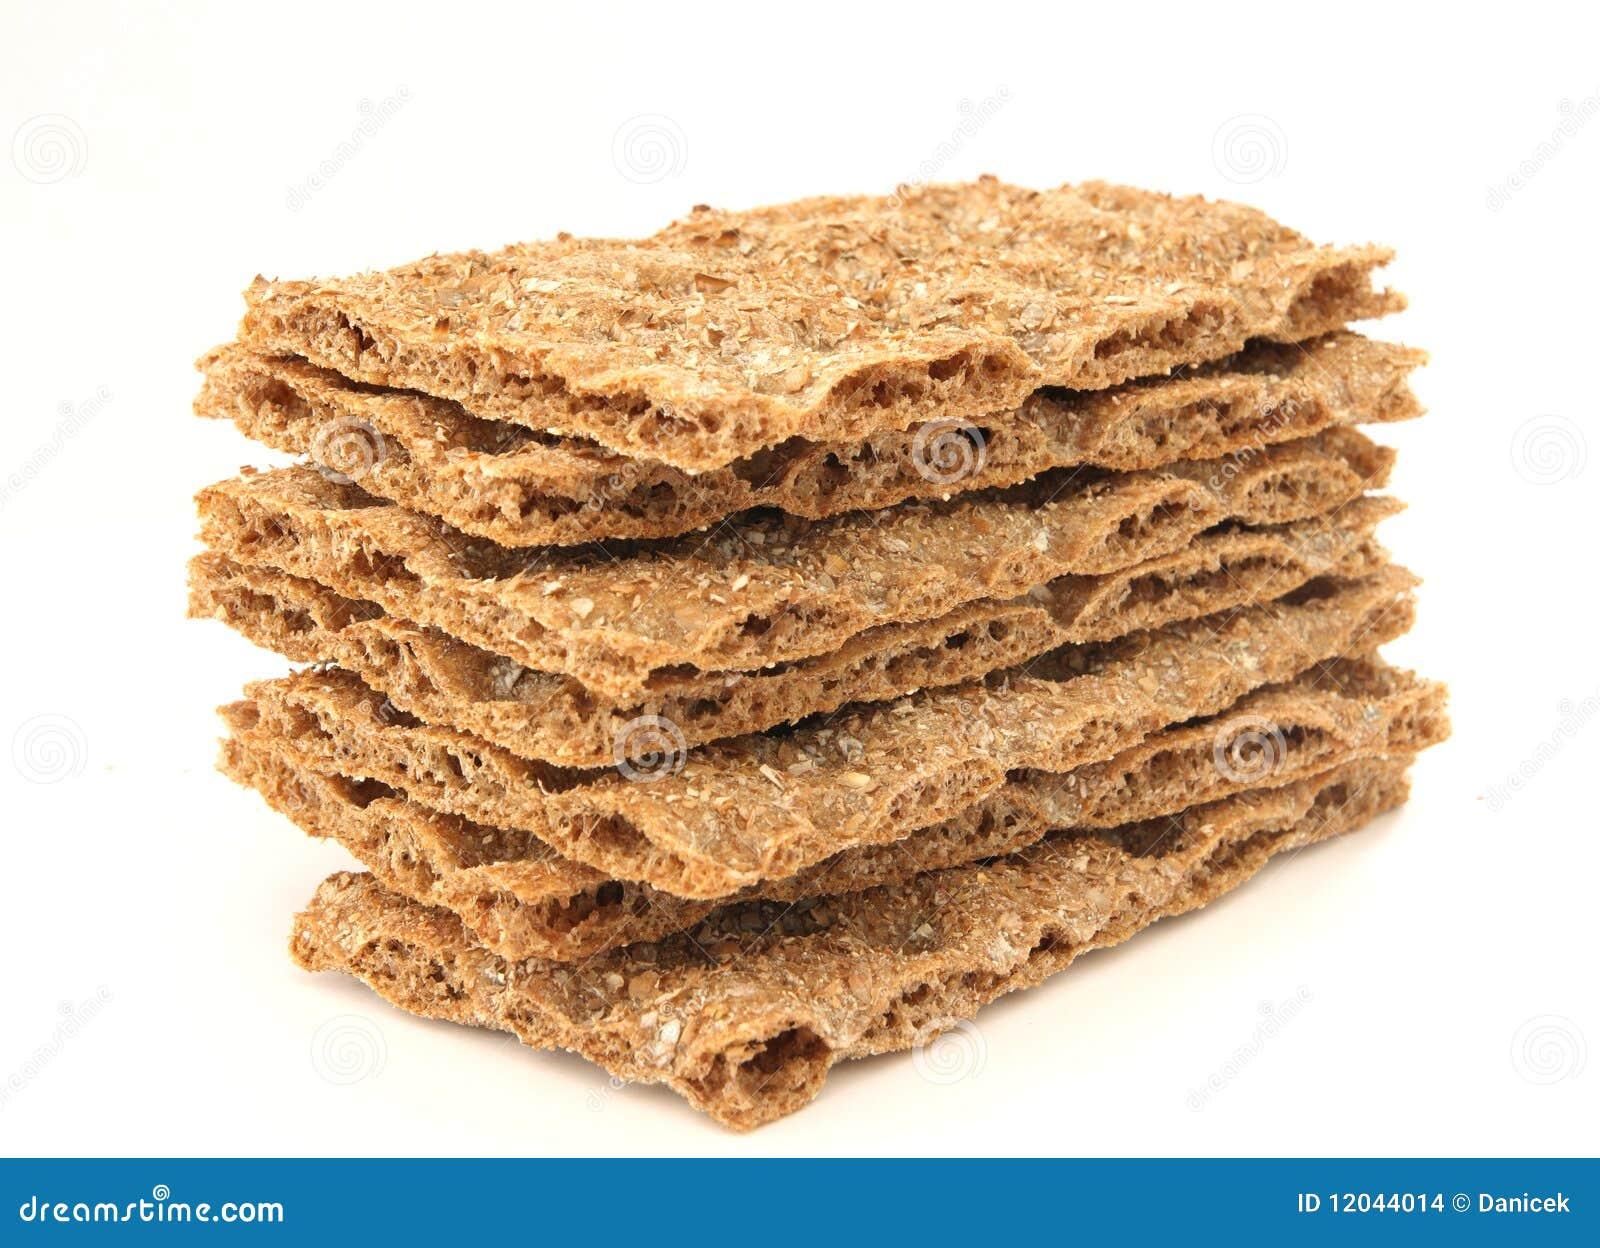 Crisp hard bread stock images image 12044014